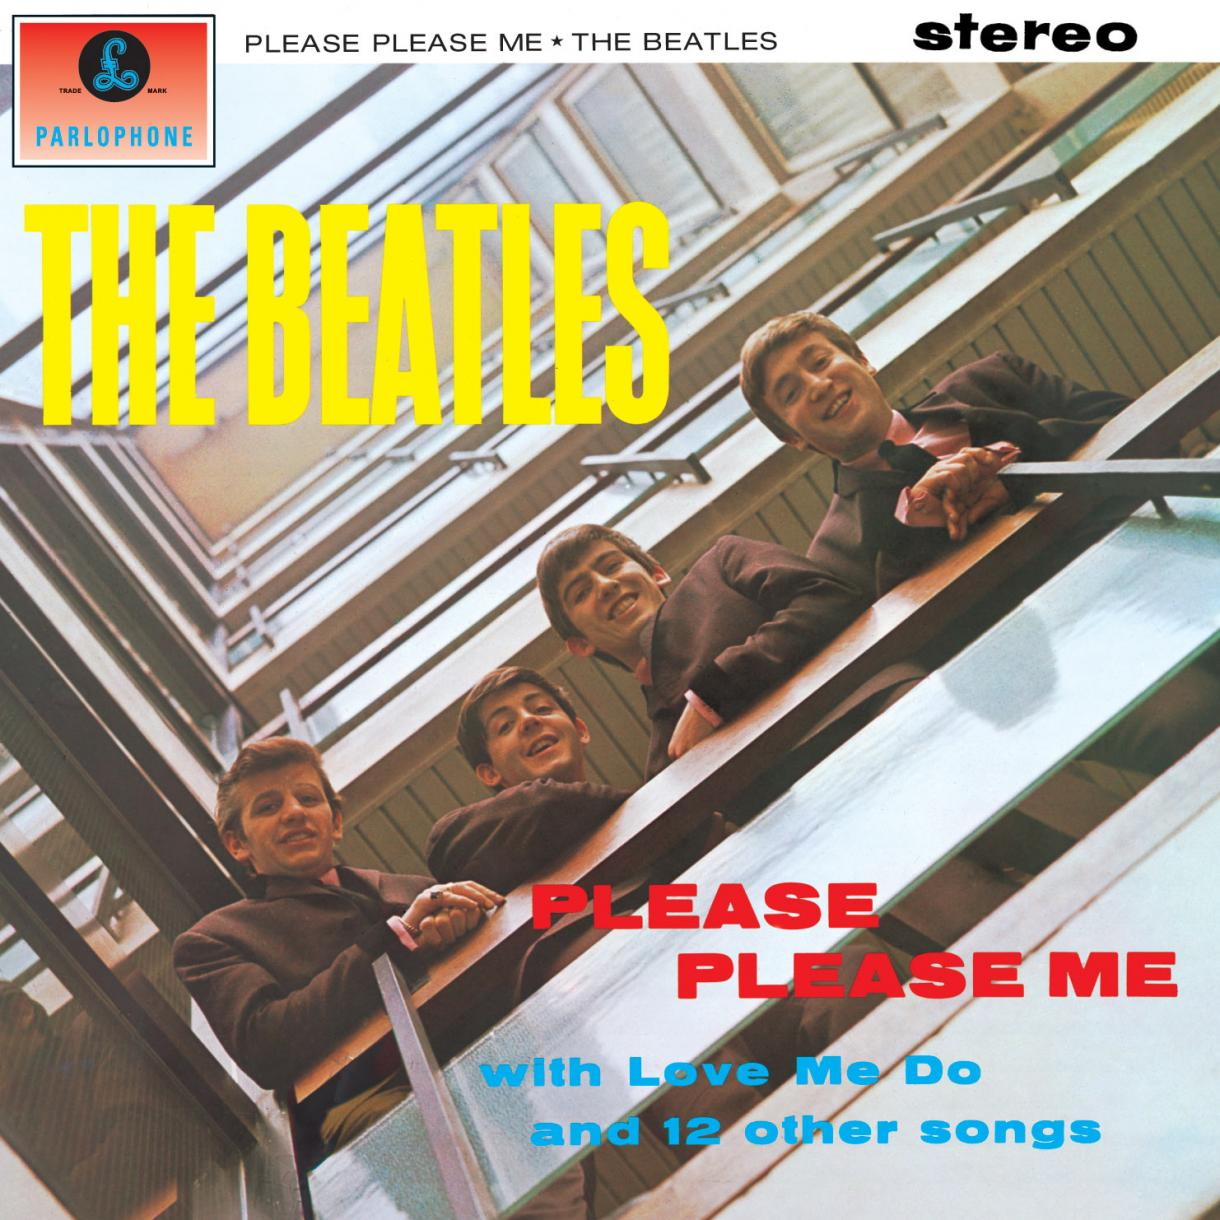 PleasePleaseMe 1962